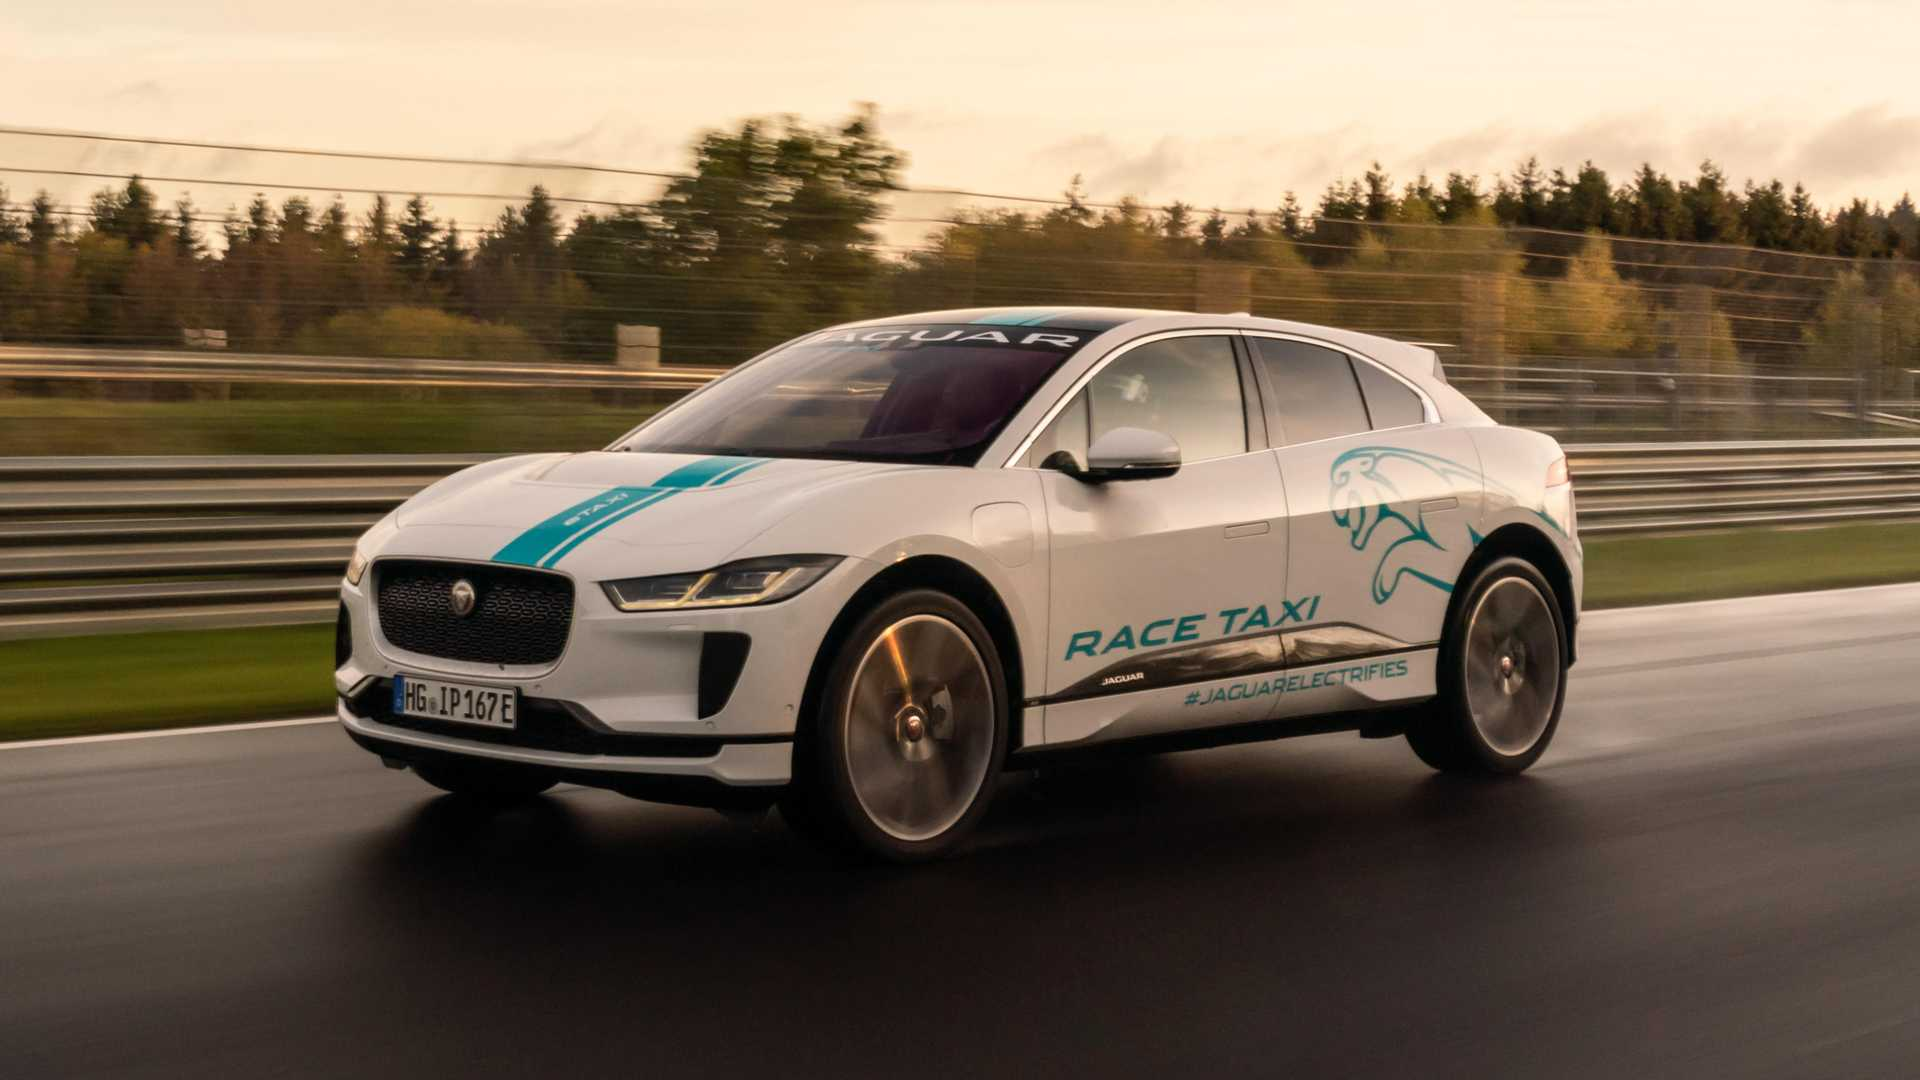 Jaguar offers eco-friendly passenger laps of the Nürburgring